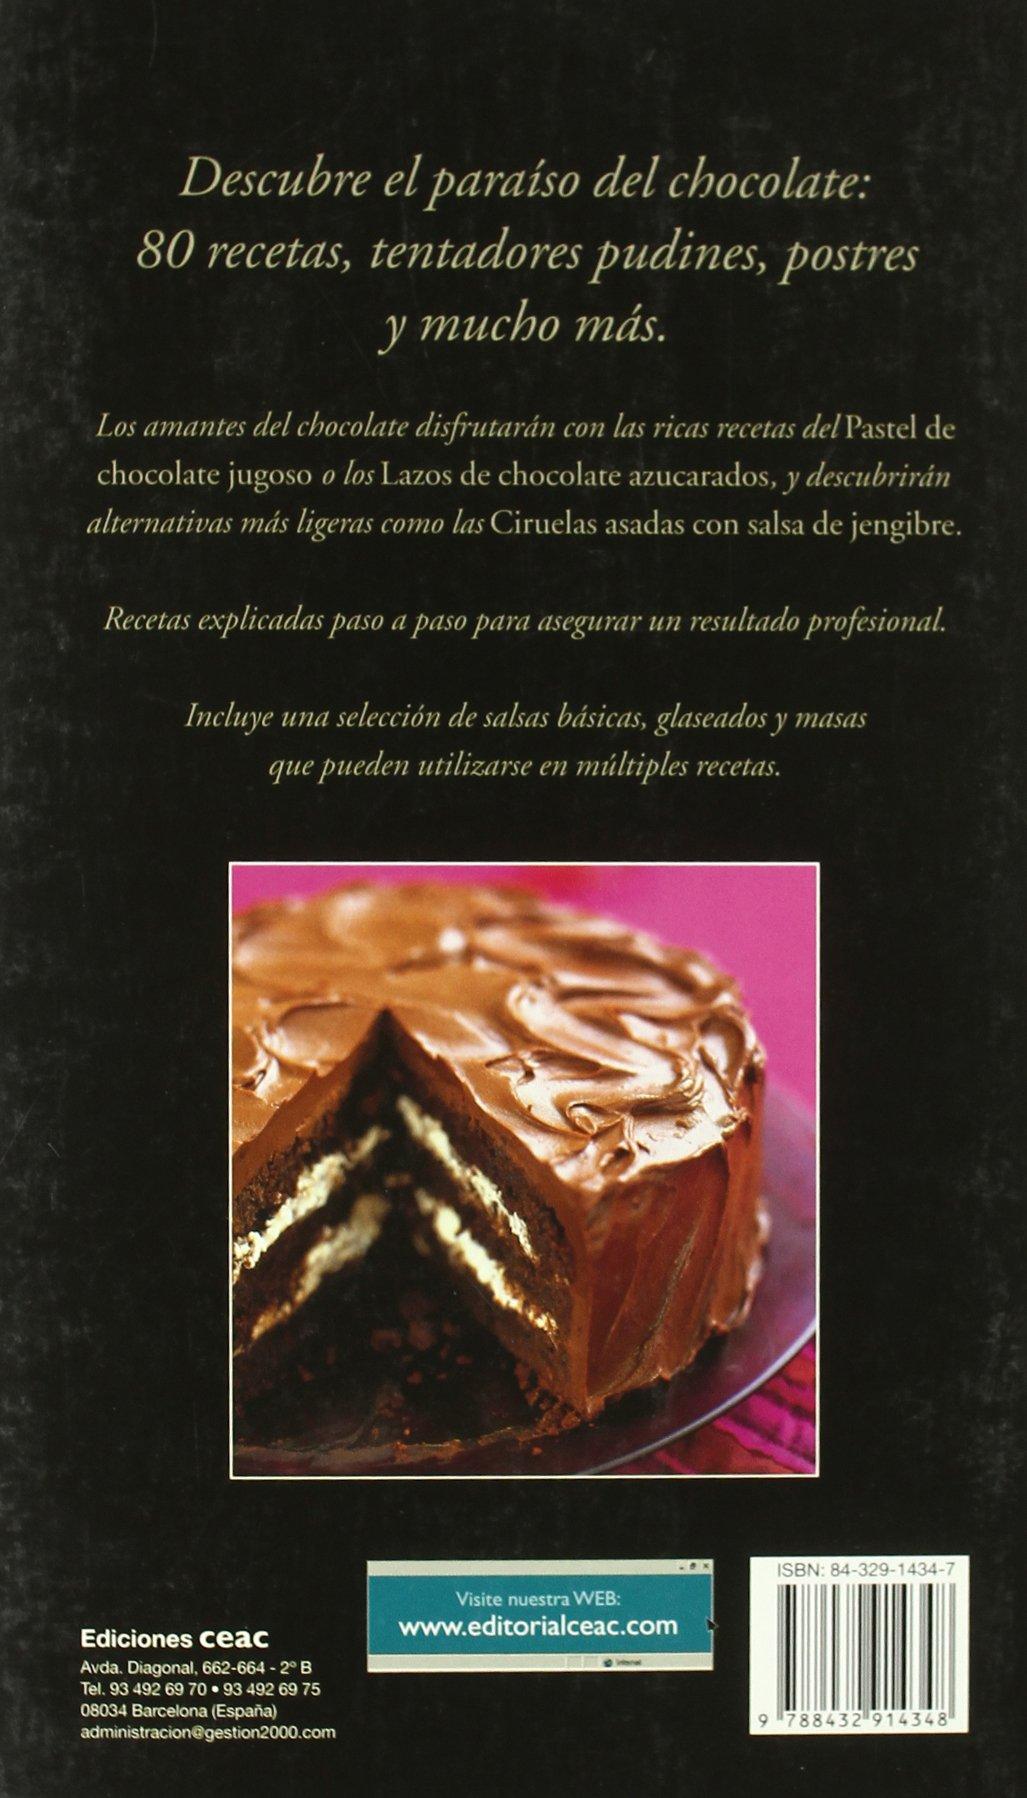 Pecados de chocolate/ Chocolate Sins: Recetas Dulces Y Sabrosas (Spanish Edition): Joanna Farrow: 9788432914348: Amazon.com: Books